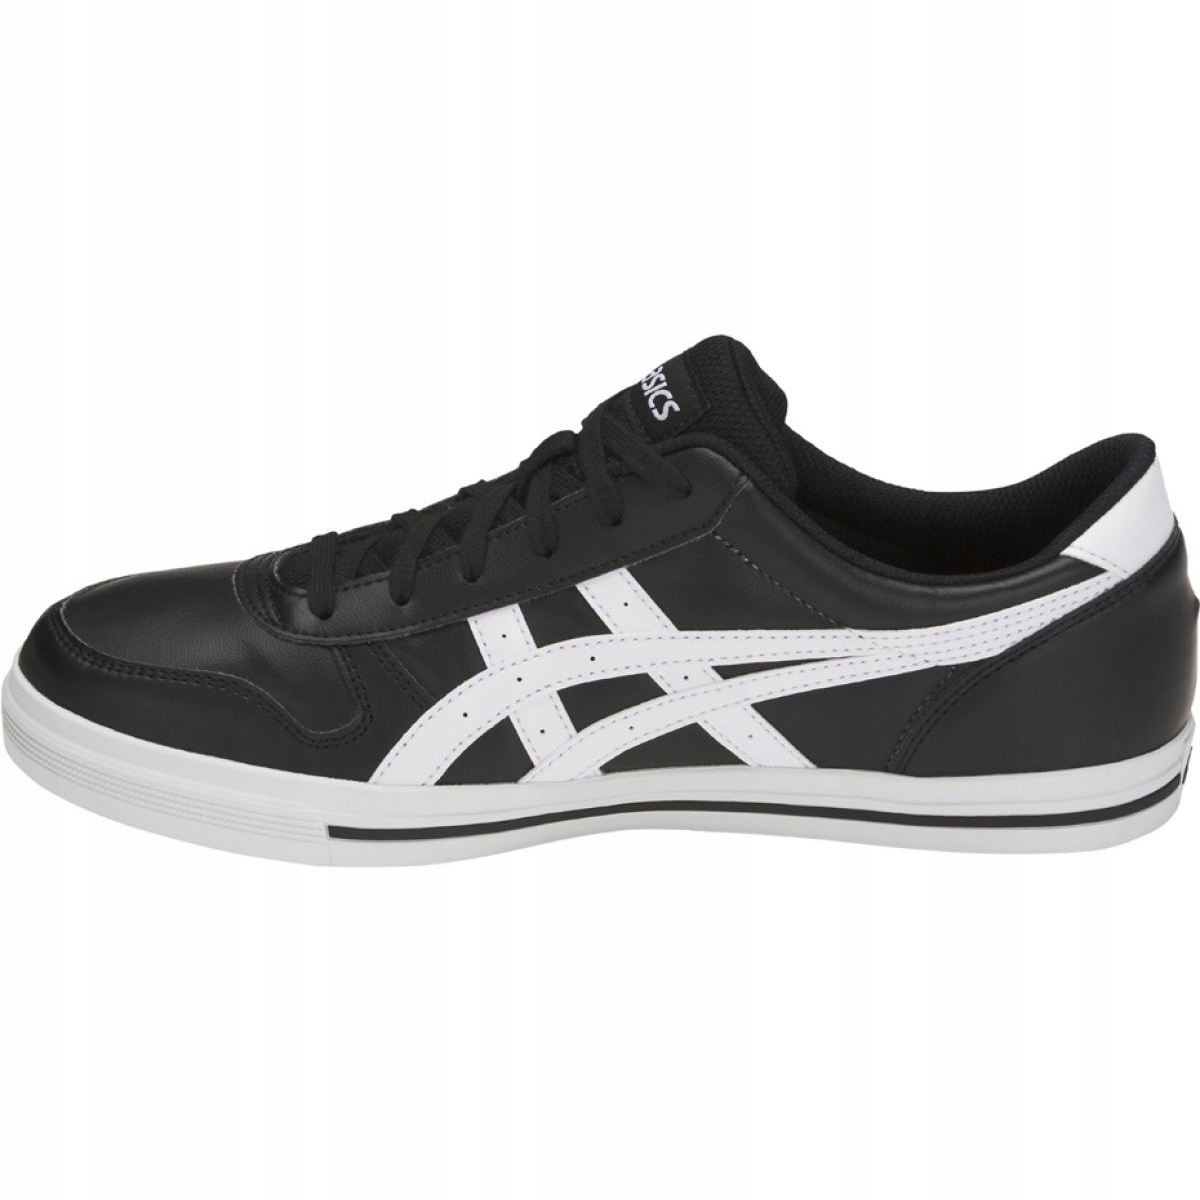 Shoes Asics Aaron M 1201A007 002 white black